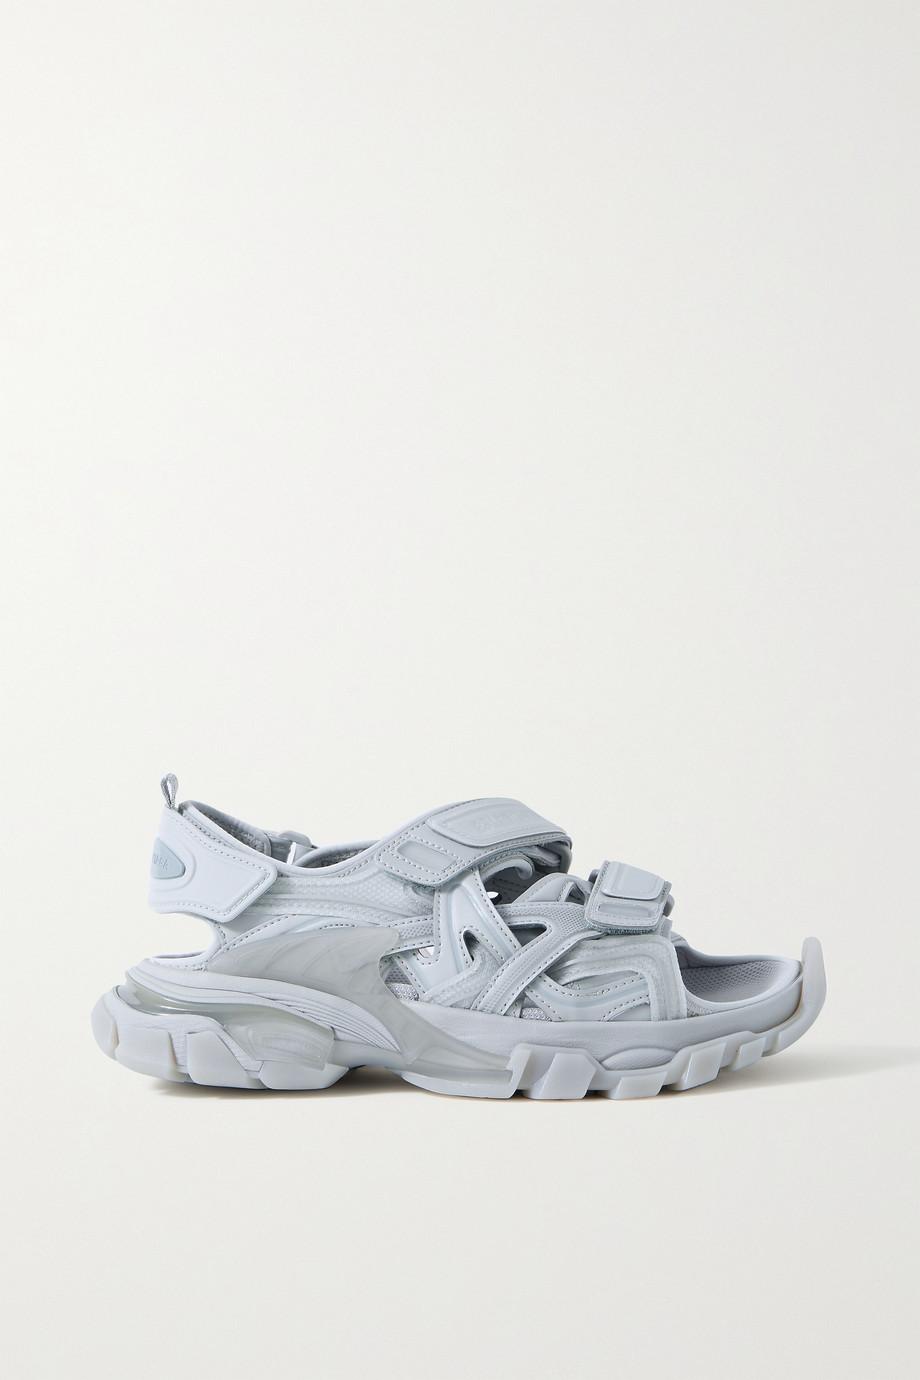 Balenciaga Track Sandalen aus Leder und Gummi mit Logoapplikation